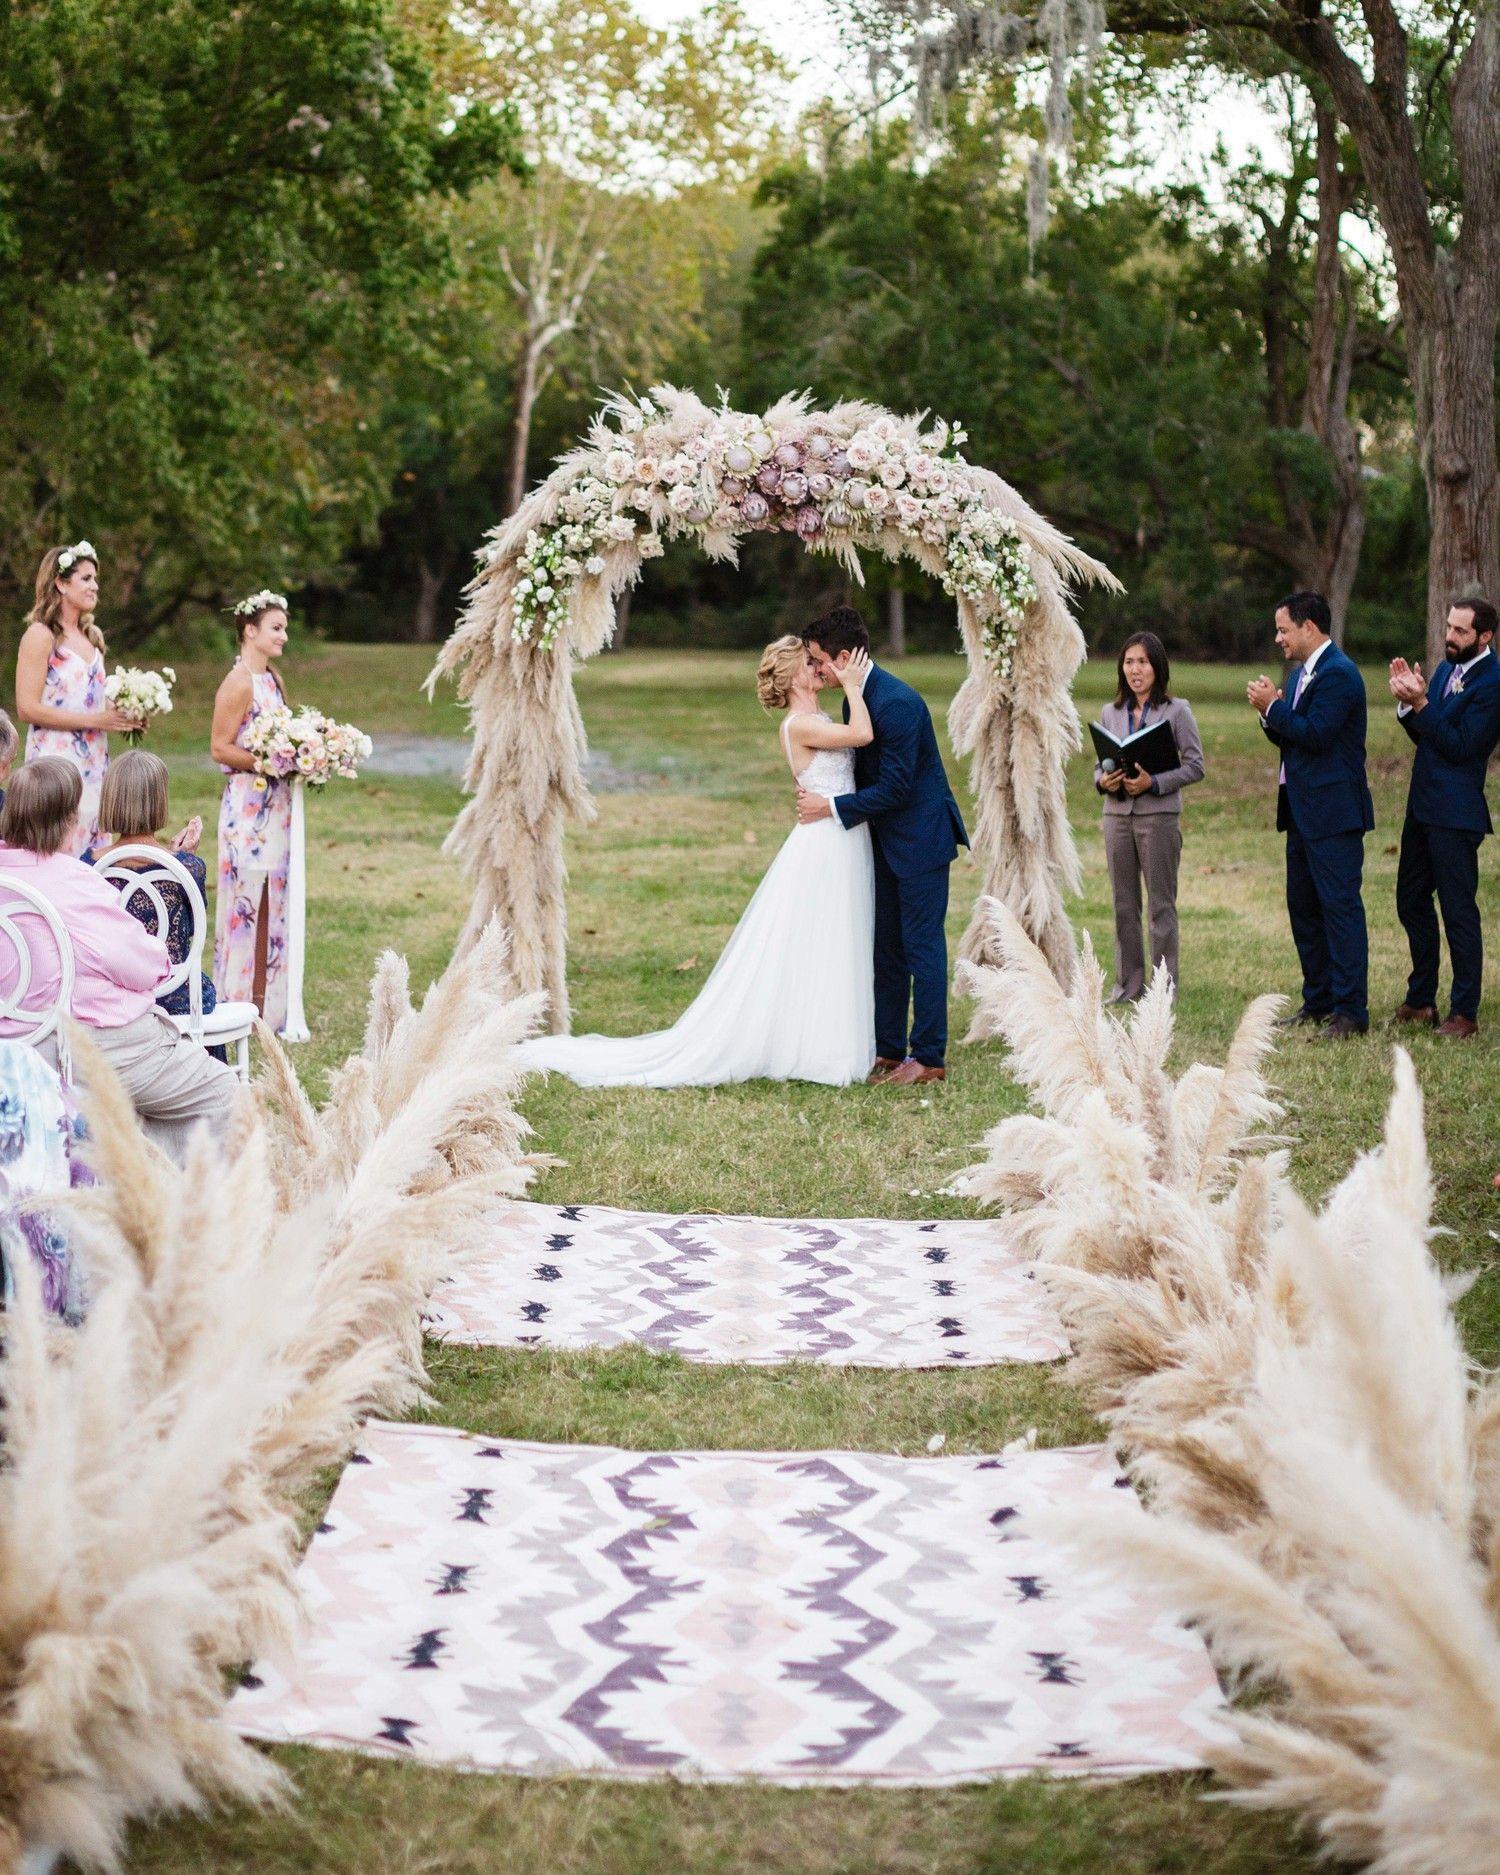 A luxe bohemian wedding in texas wedding party wedding and grooms